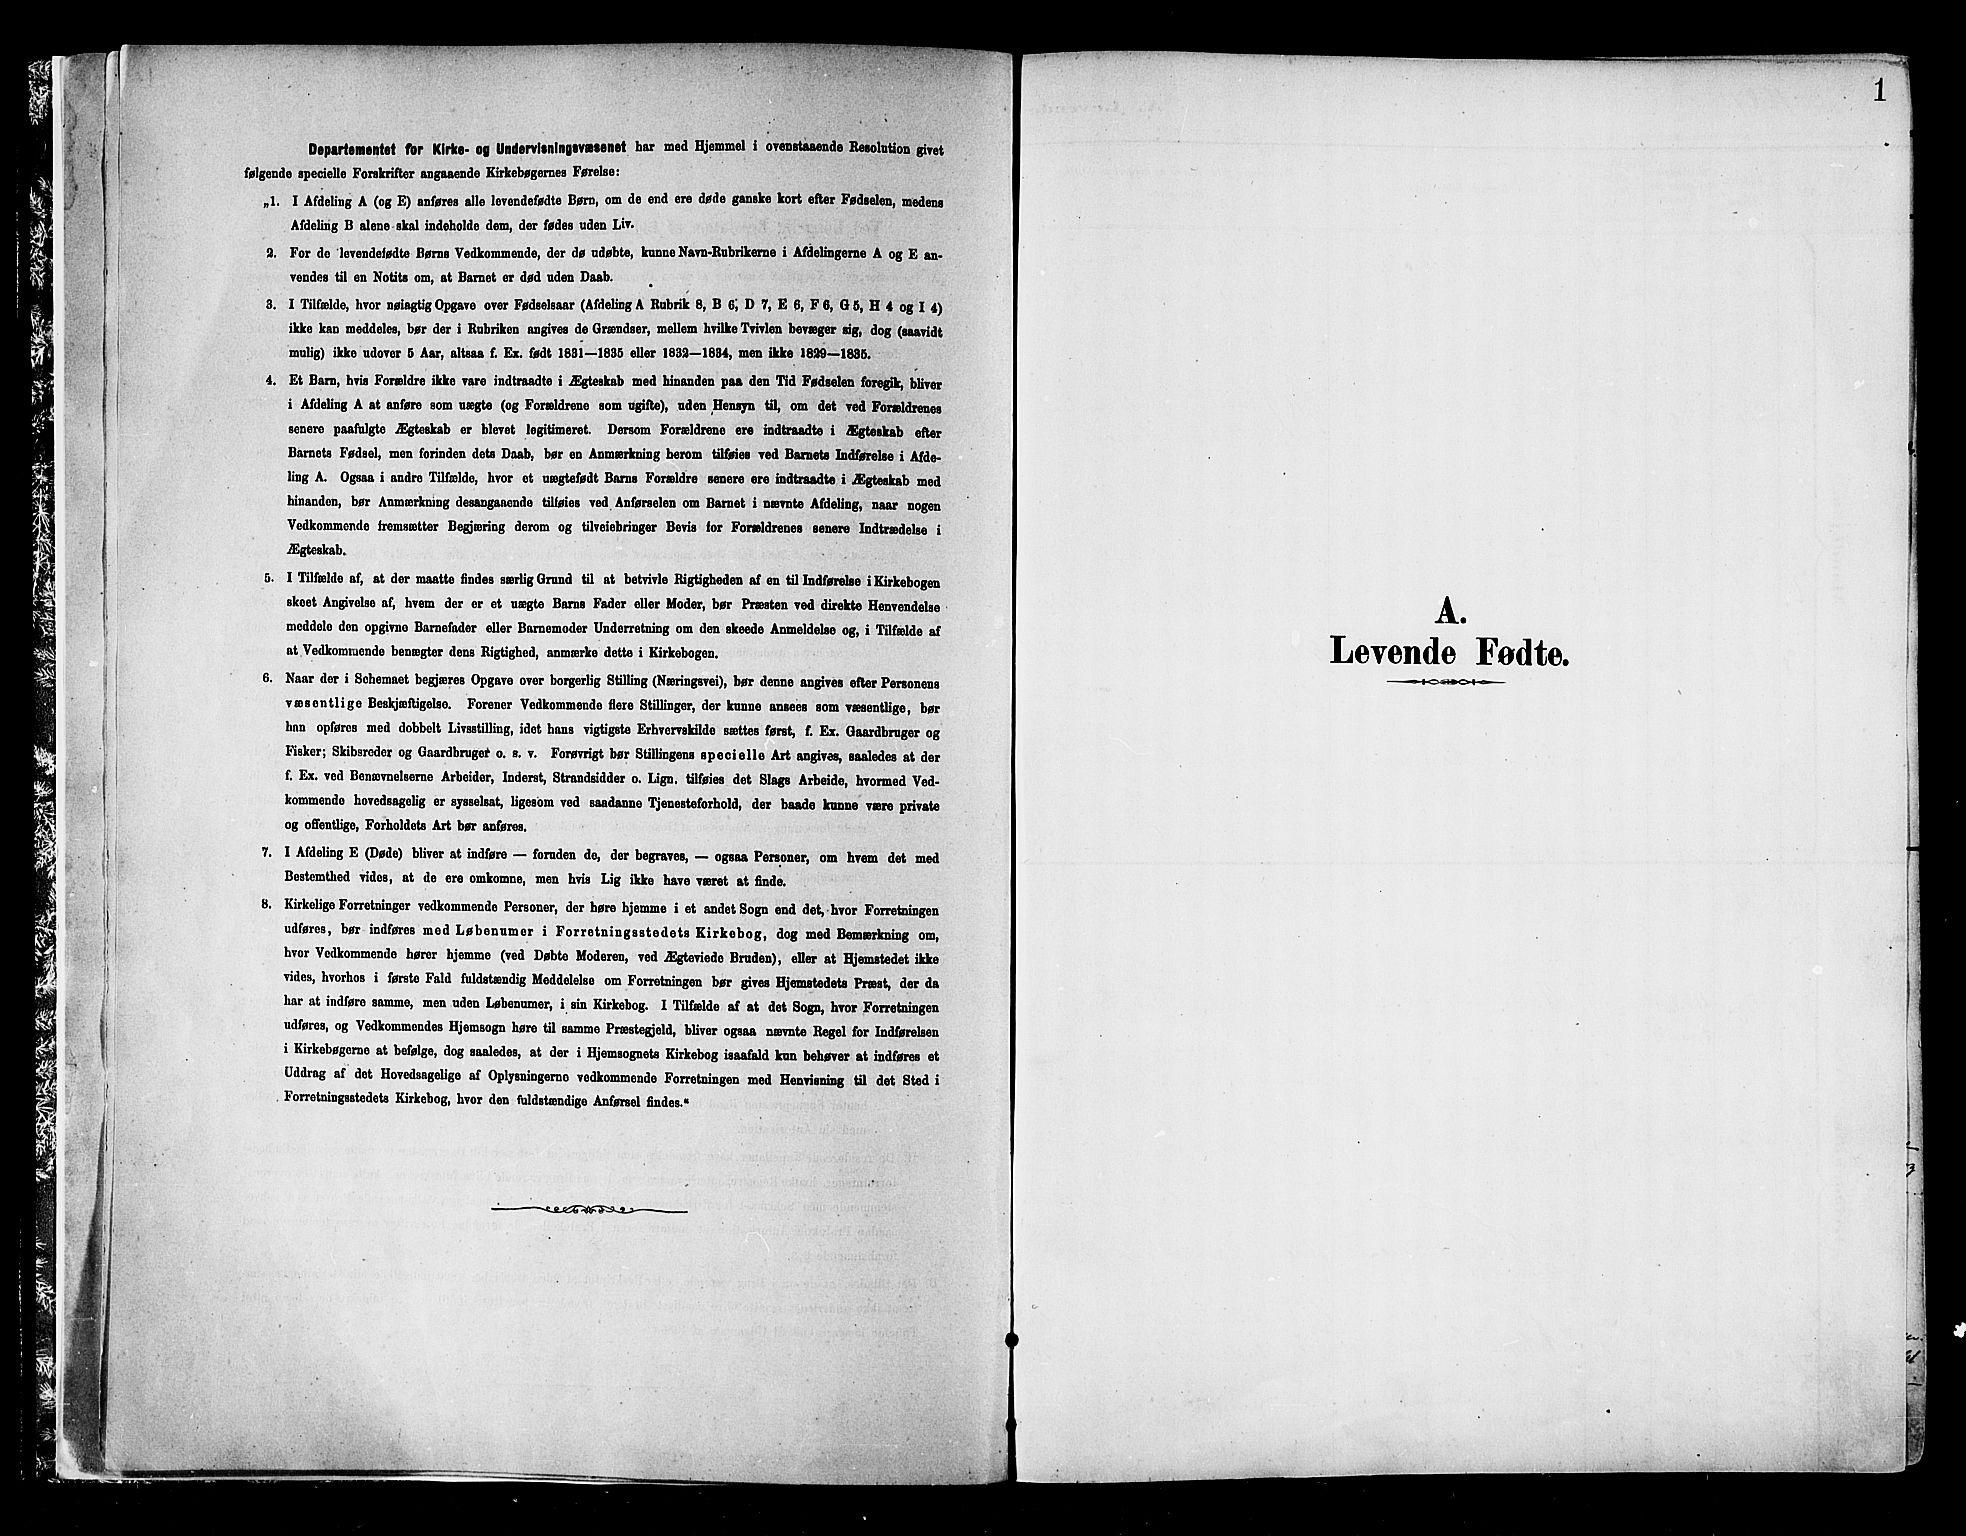 SATØ, Skjervøy sokneprestkontor, H/Ha/Haa/L0010kirke: Ministerialbok nr. 10, 1887-1898, s. 1